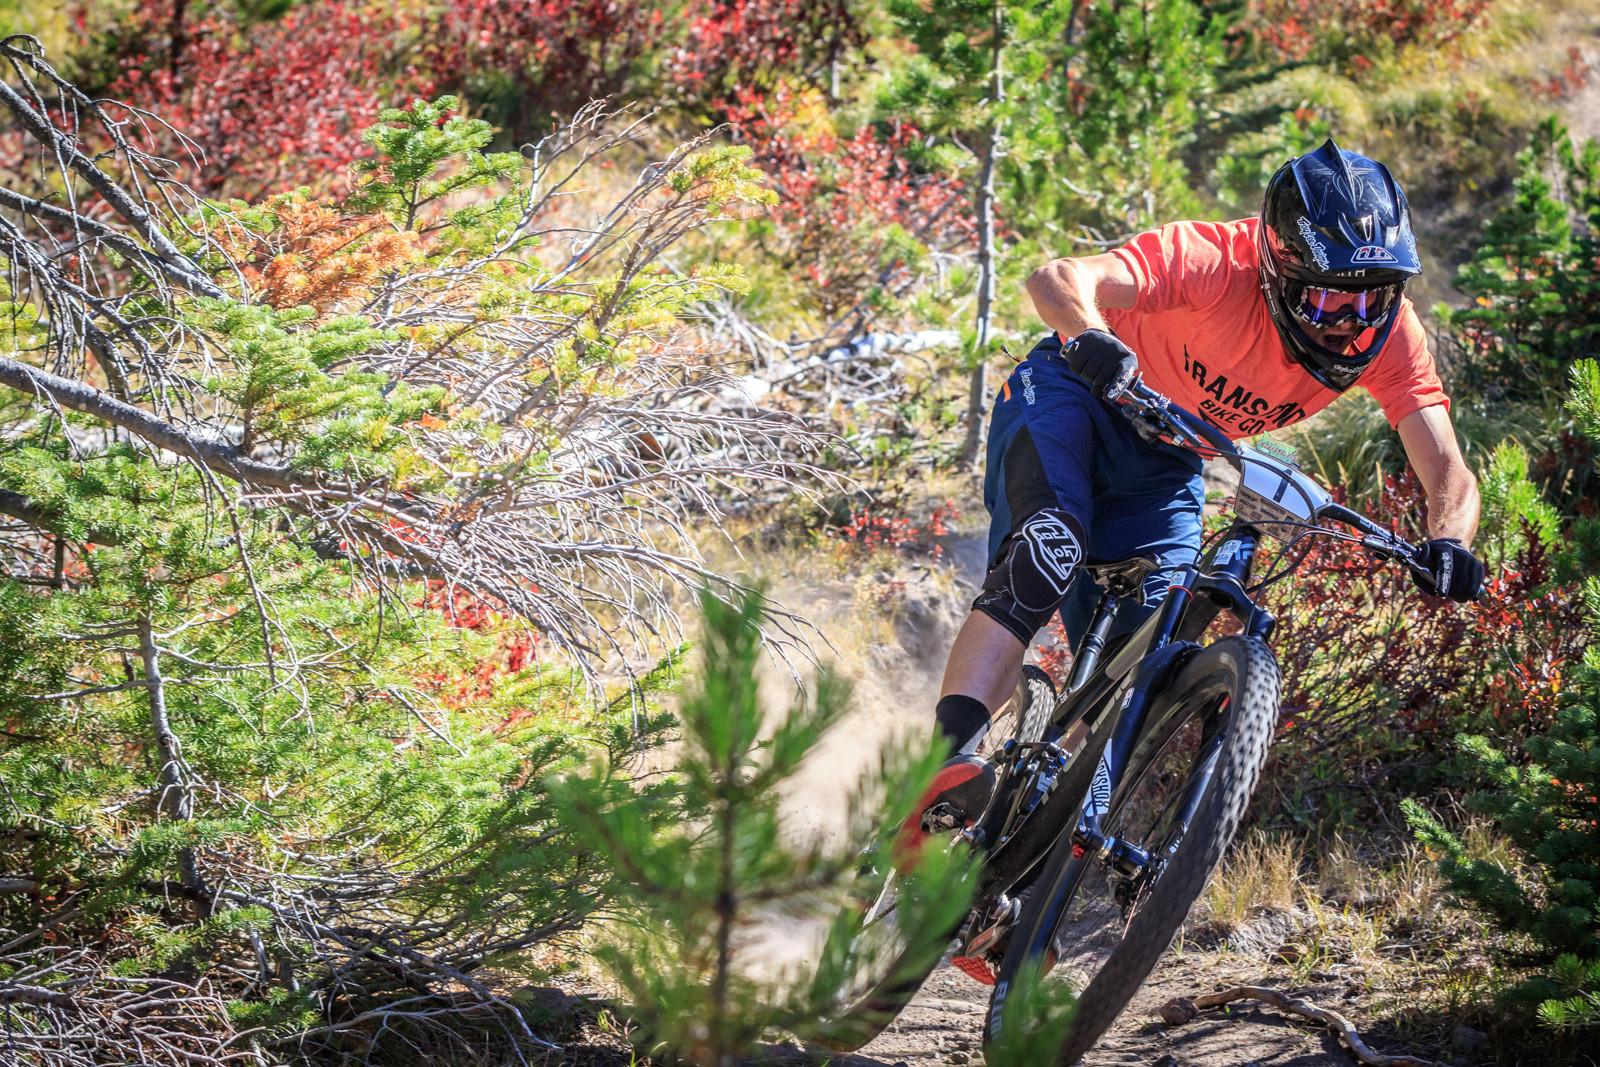 Krunk_Shox - 2015 Oregon Enduro Series Finals Mt. Hood - Mountain Biking Pictures - Vital MTB